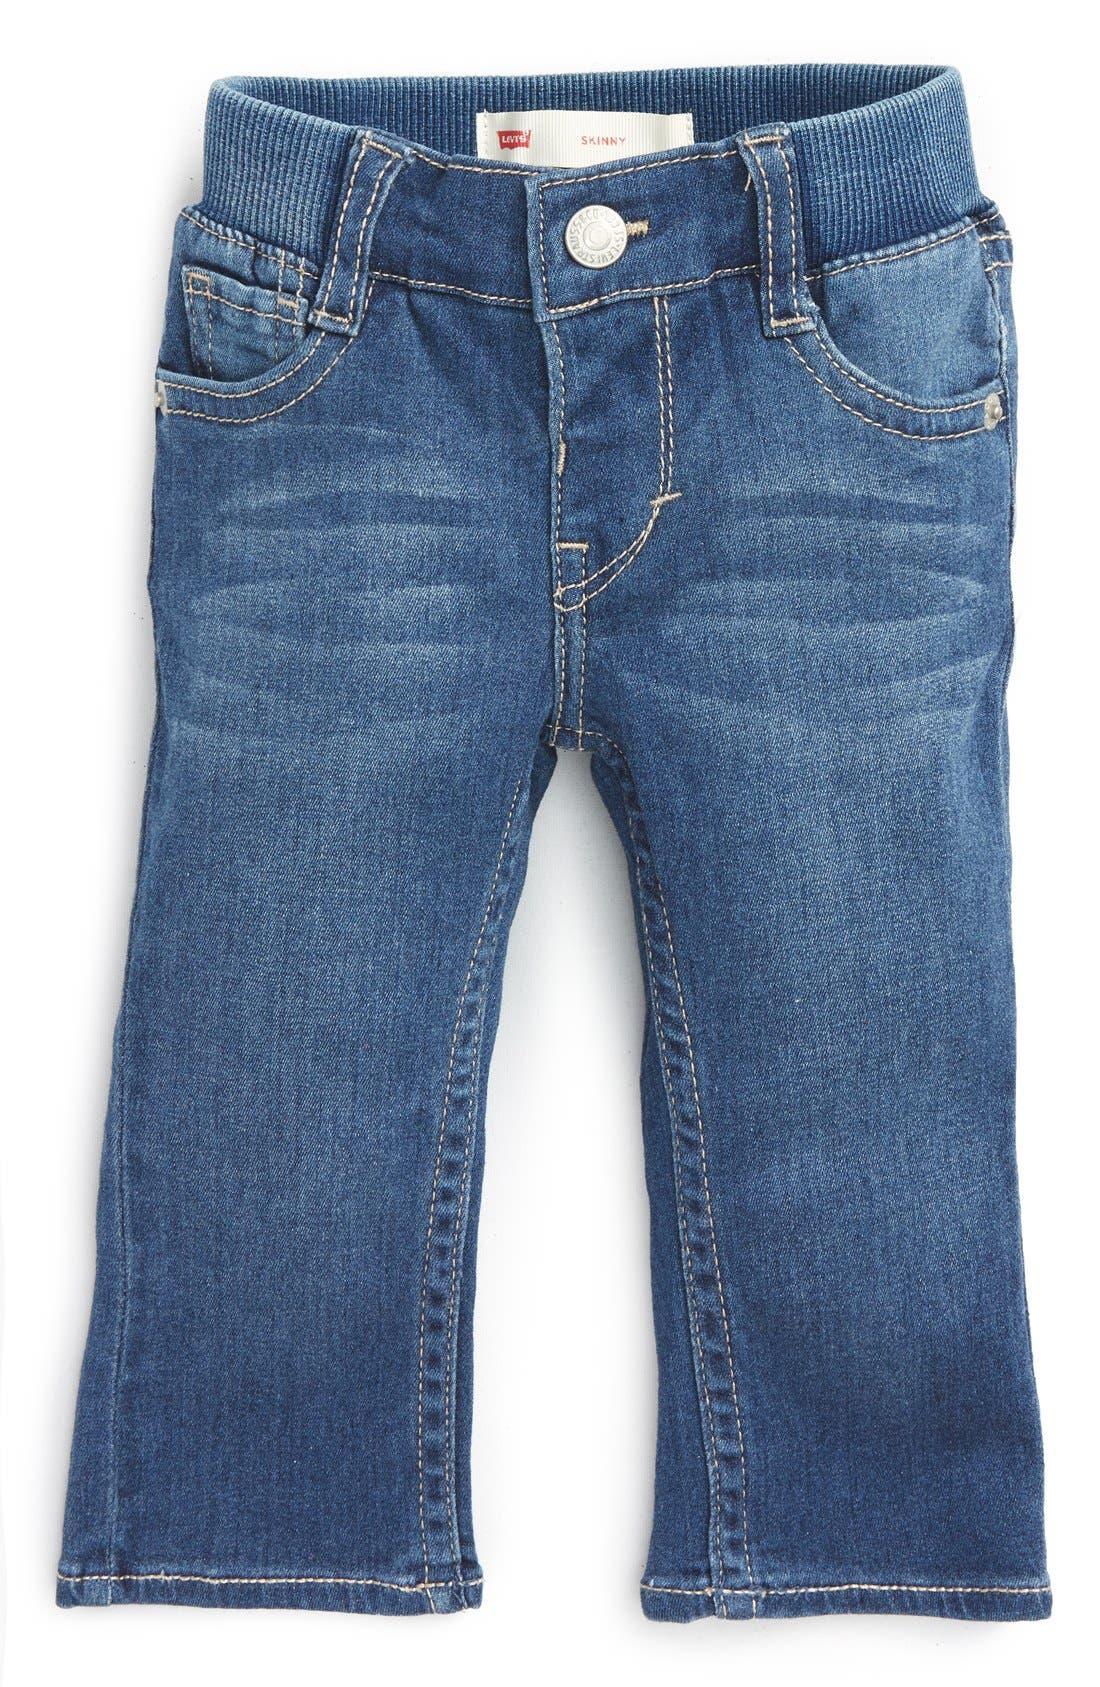 Skinny Jeans,                             Main thumbnail 1, color,                             Costal